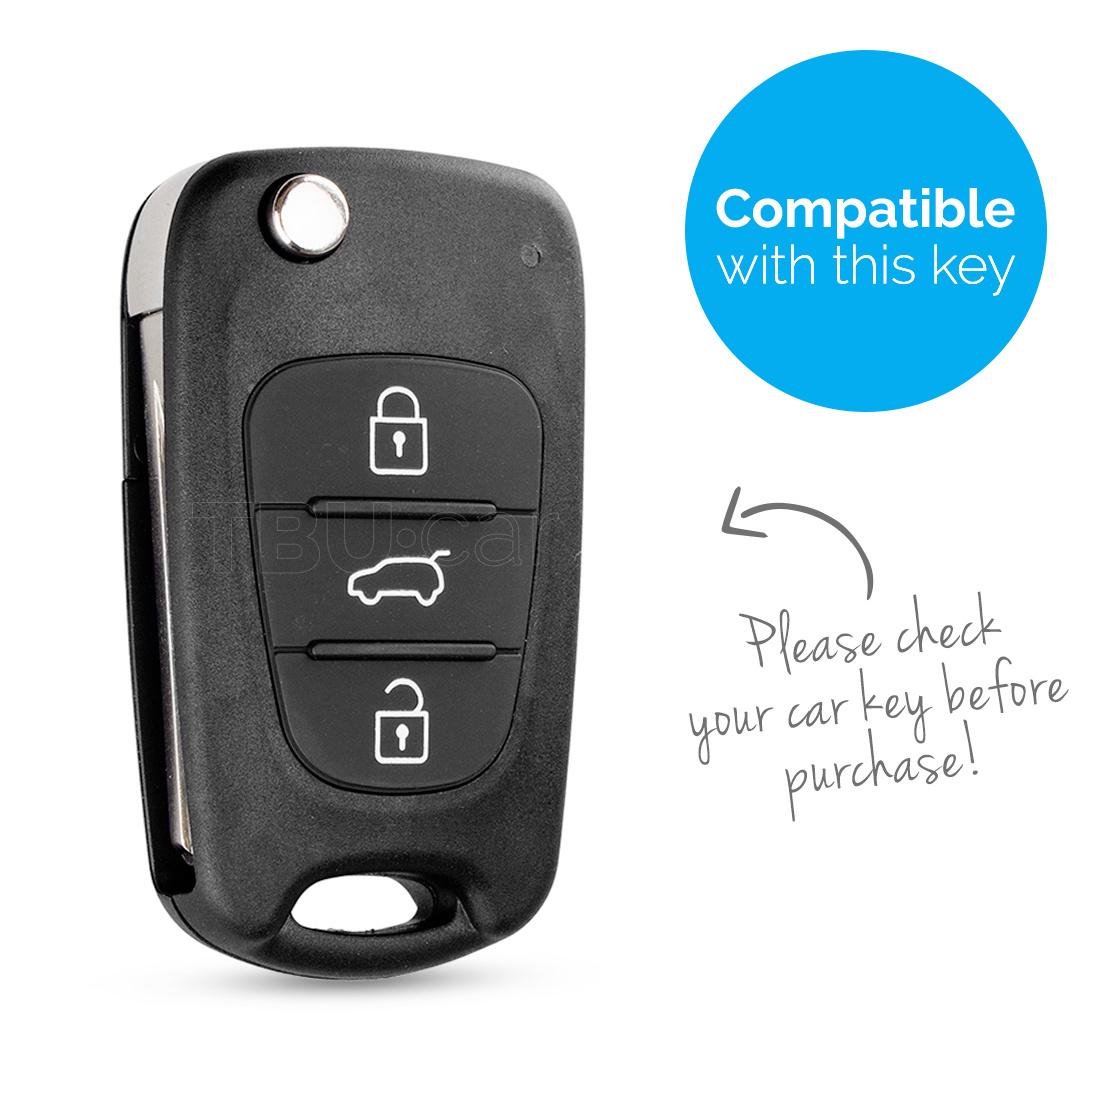 TBU car TBU car Sleutel cover compatibel met Hyundai - Silicone sleutelhoesje - beschermhoesje autosleutel - Roze